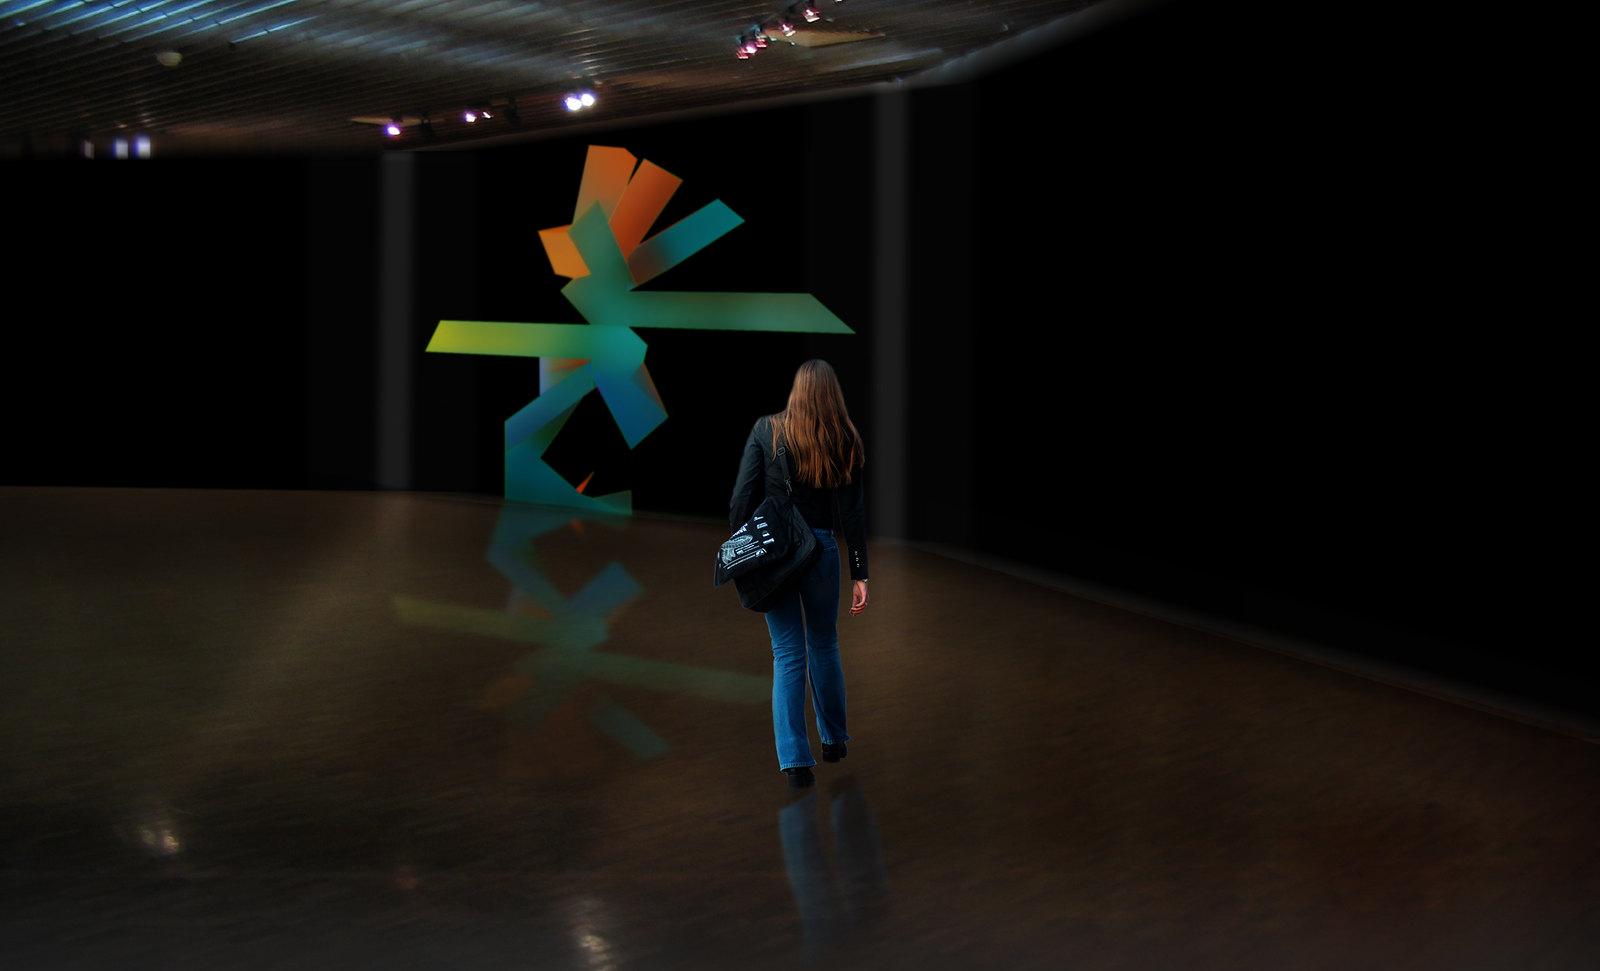 Escultura MAM mx 006